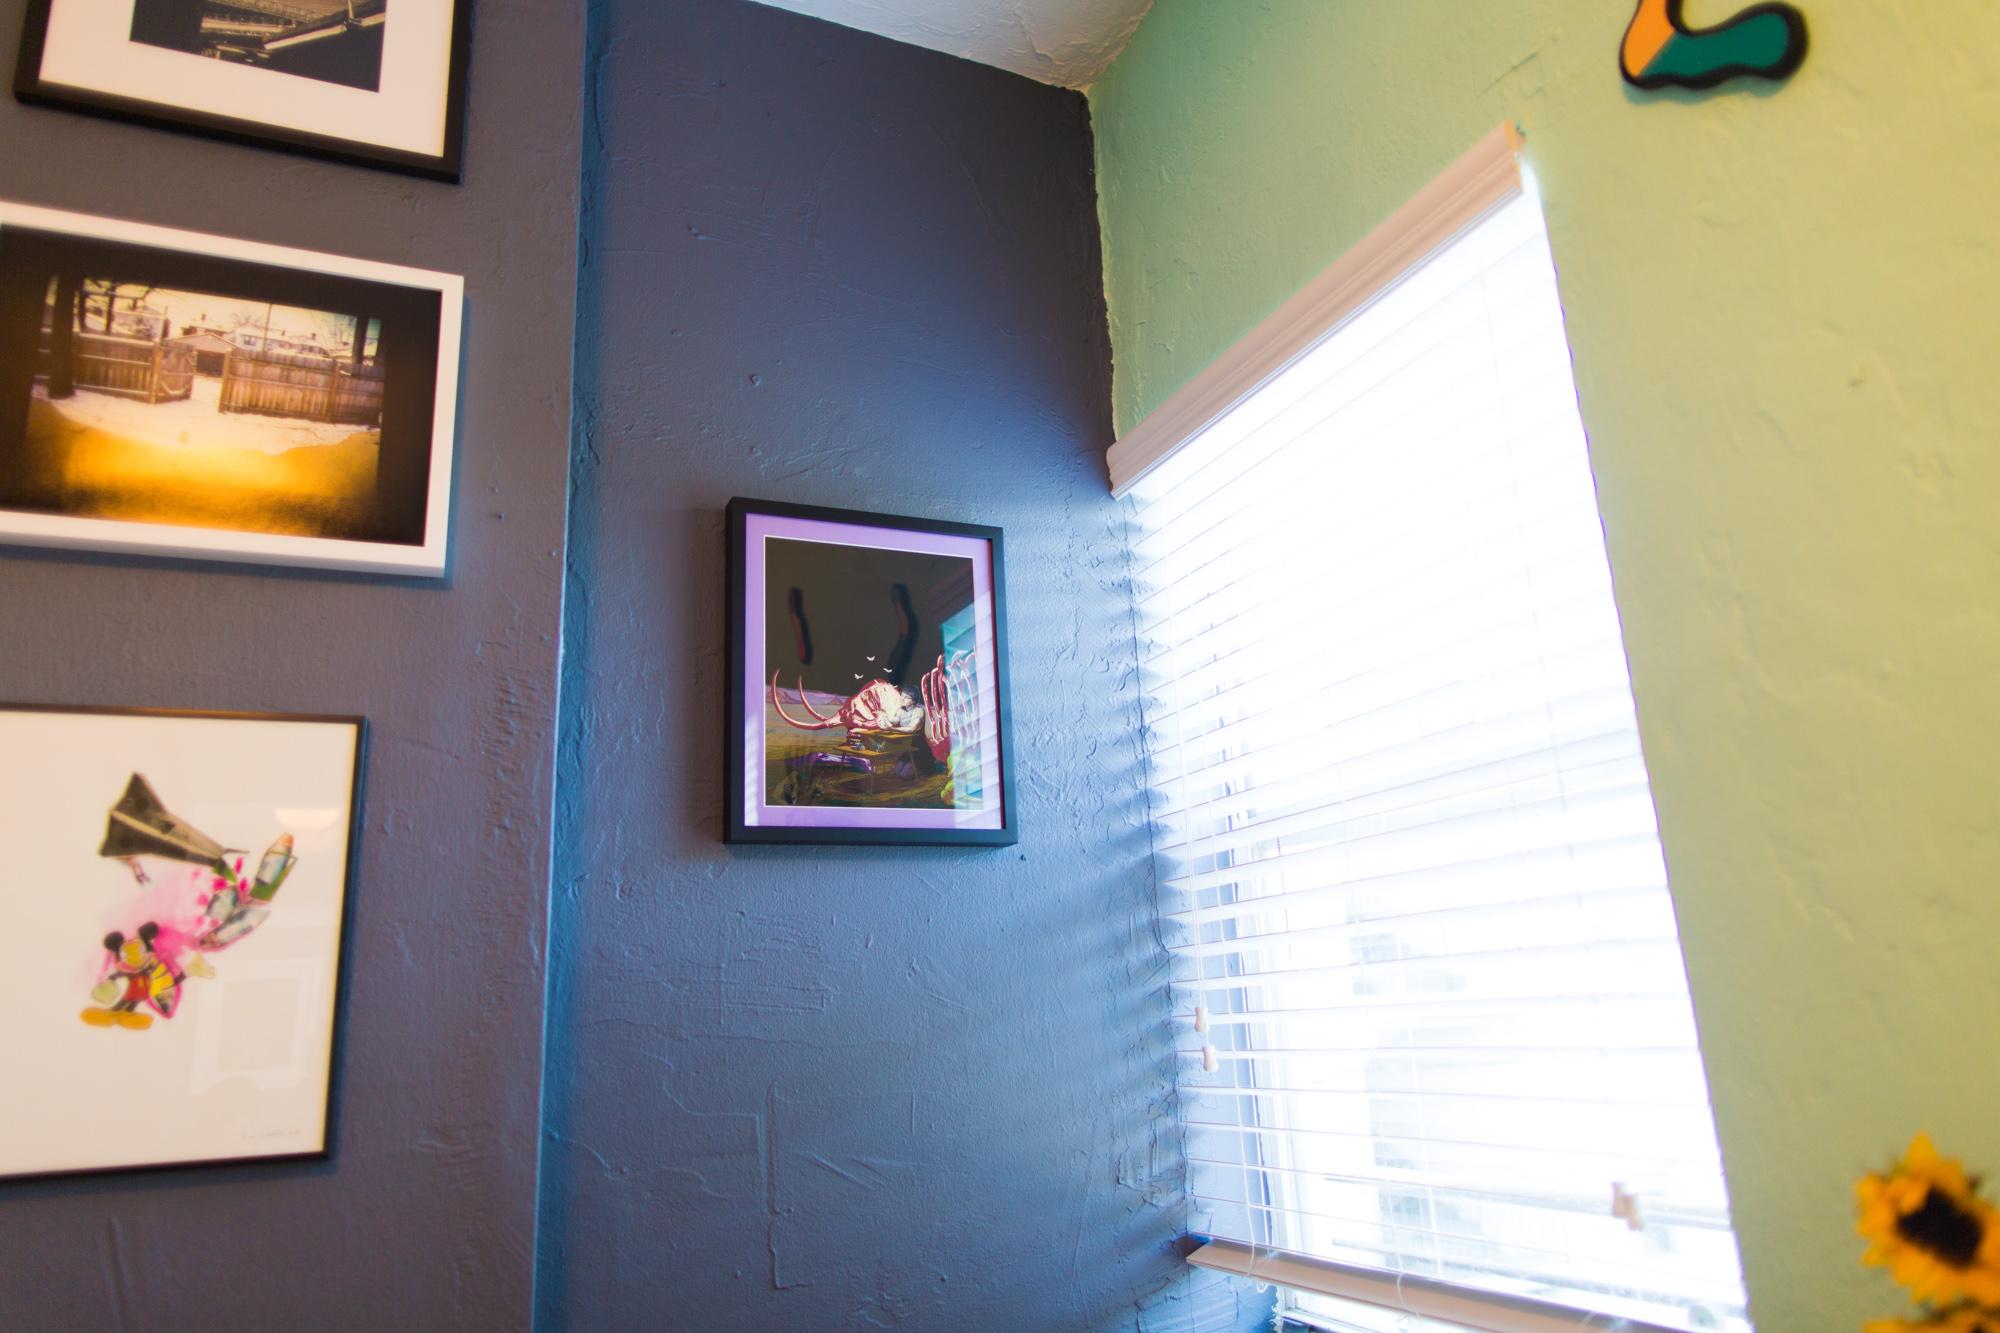 "(clockwise from bottom left) Untitled by Mina El Bakali via  Galerie 55Bellechasse , ""Wave"" by  Mark Reamy , print by Bryan Adams Douglas via  Heliotrope Prints"